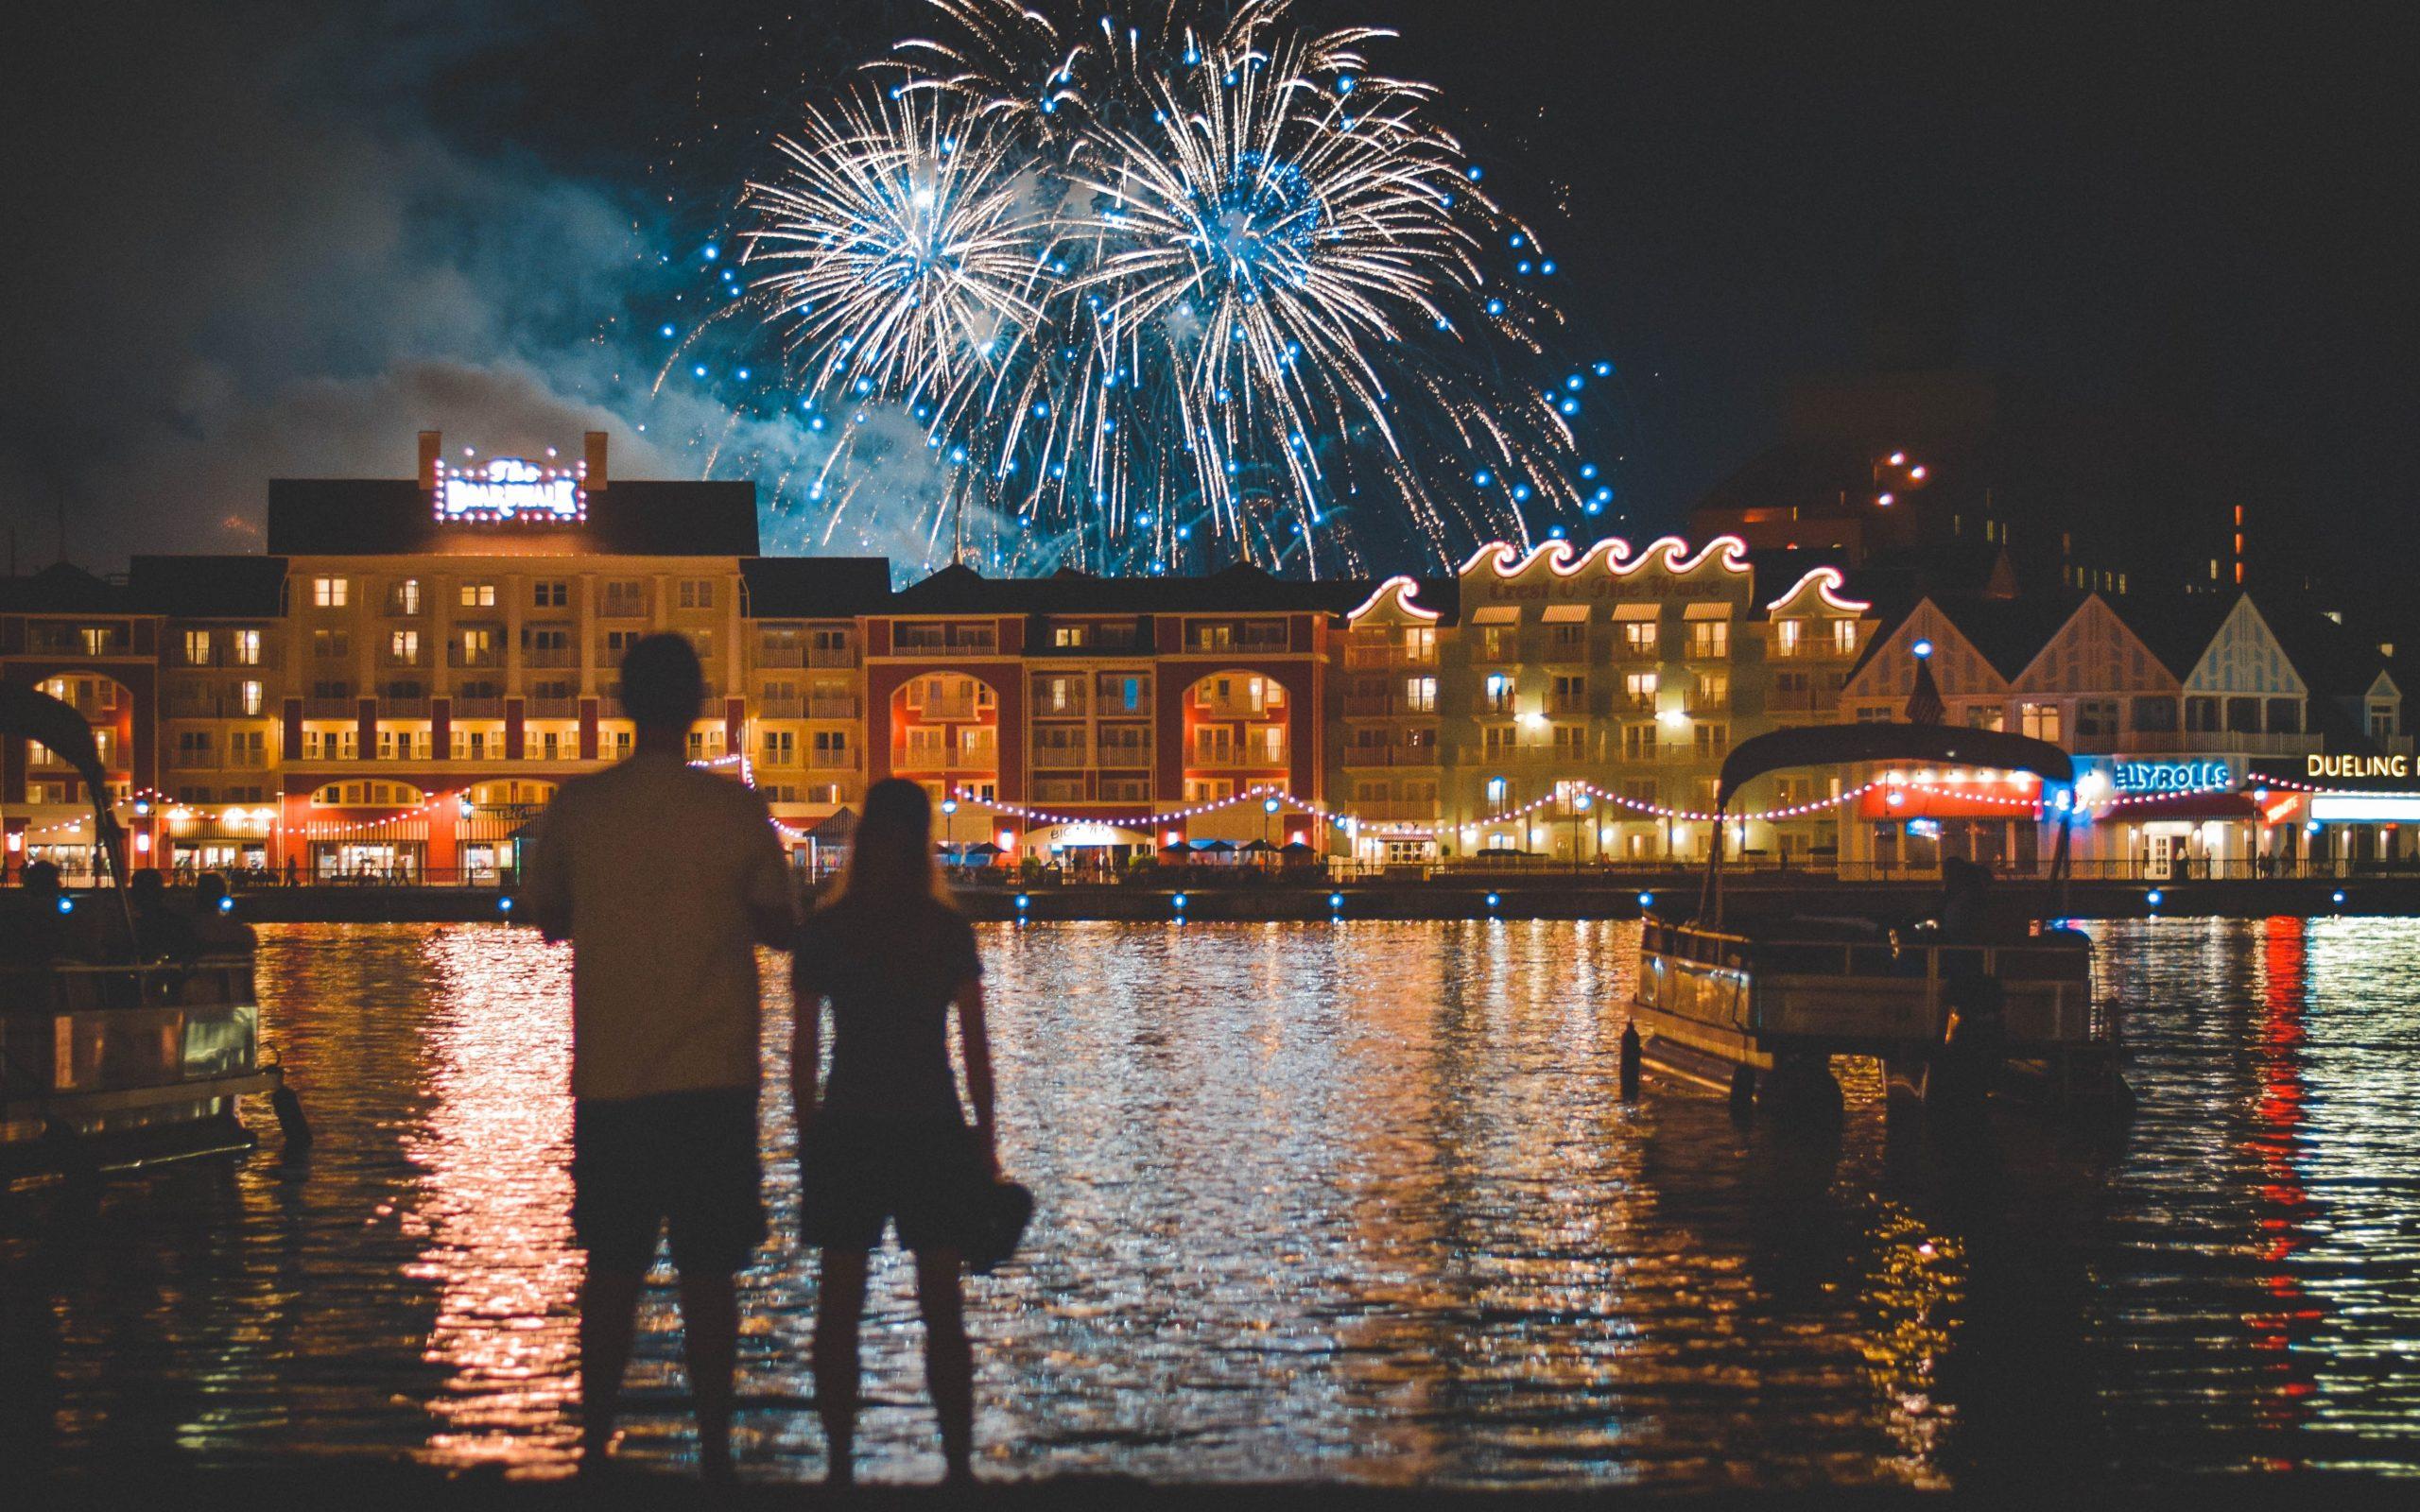 Man and woman watch fireworks above Disney's Boardwalk Resort